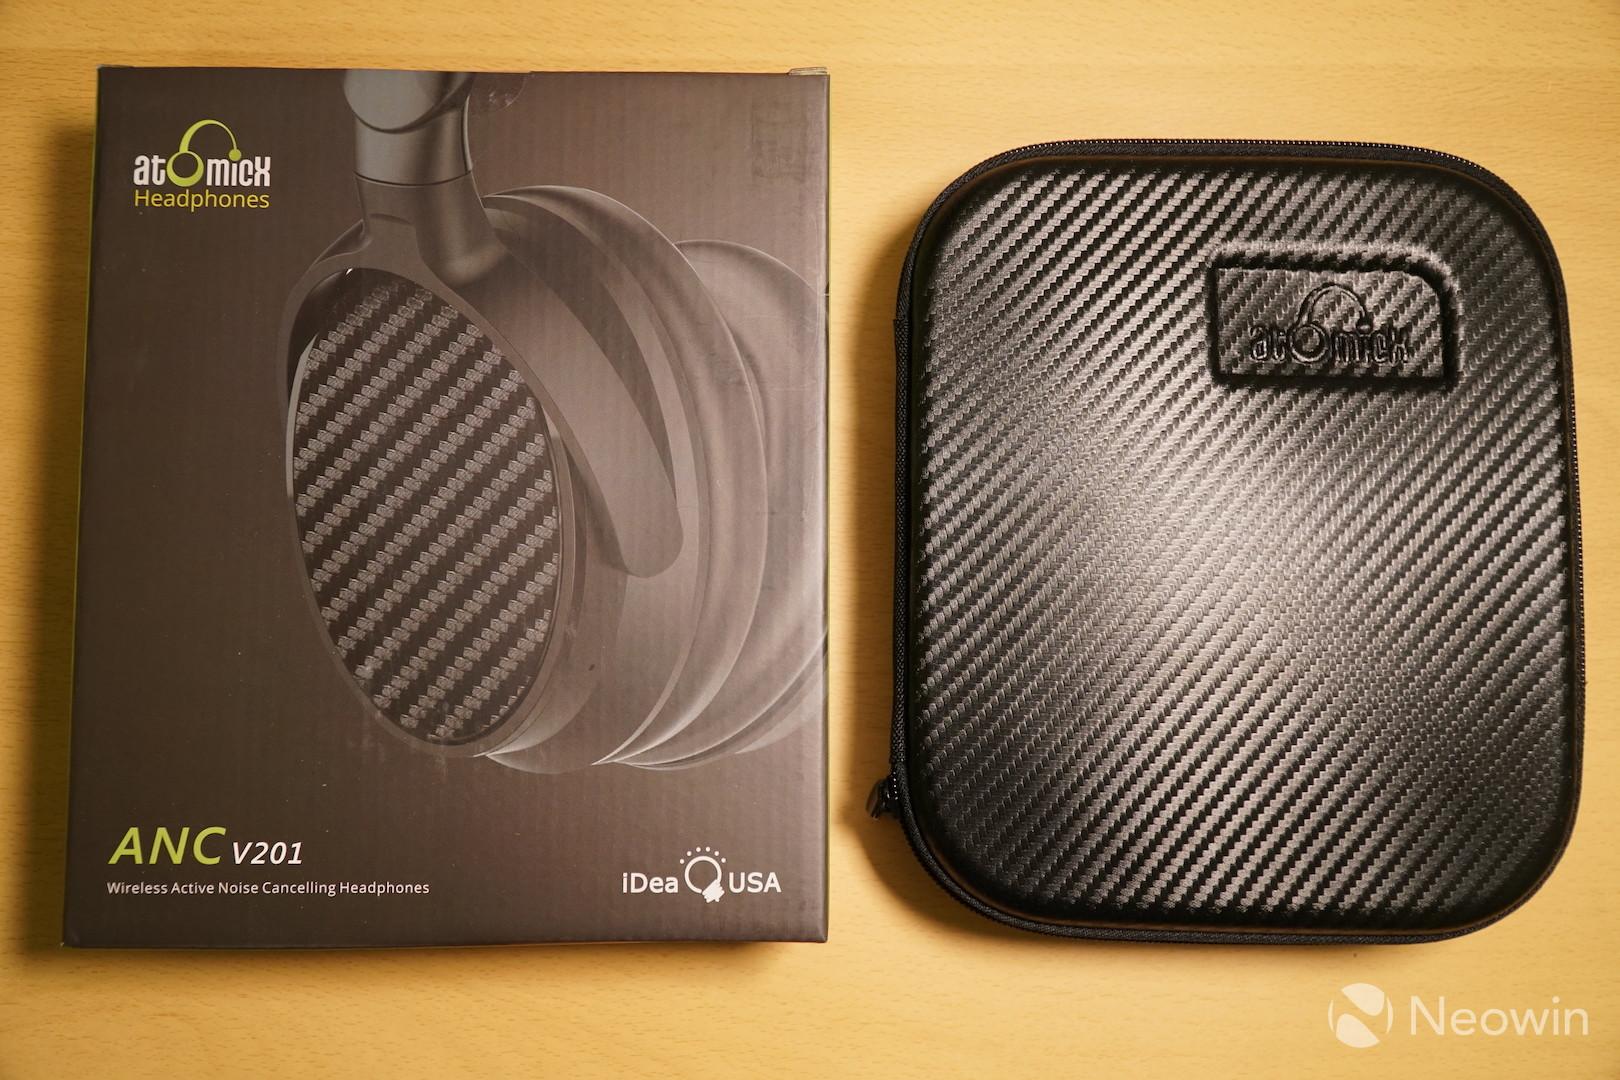 16c8cc720f9 iDeaUSA V201 review: Noise-cancelling headphones that don't quite ...